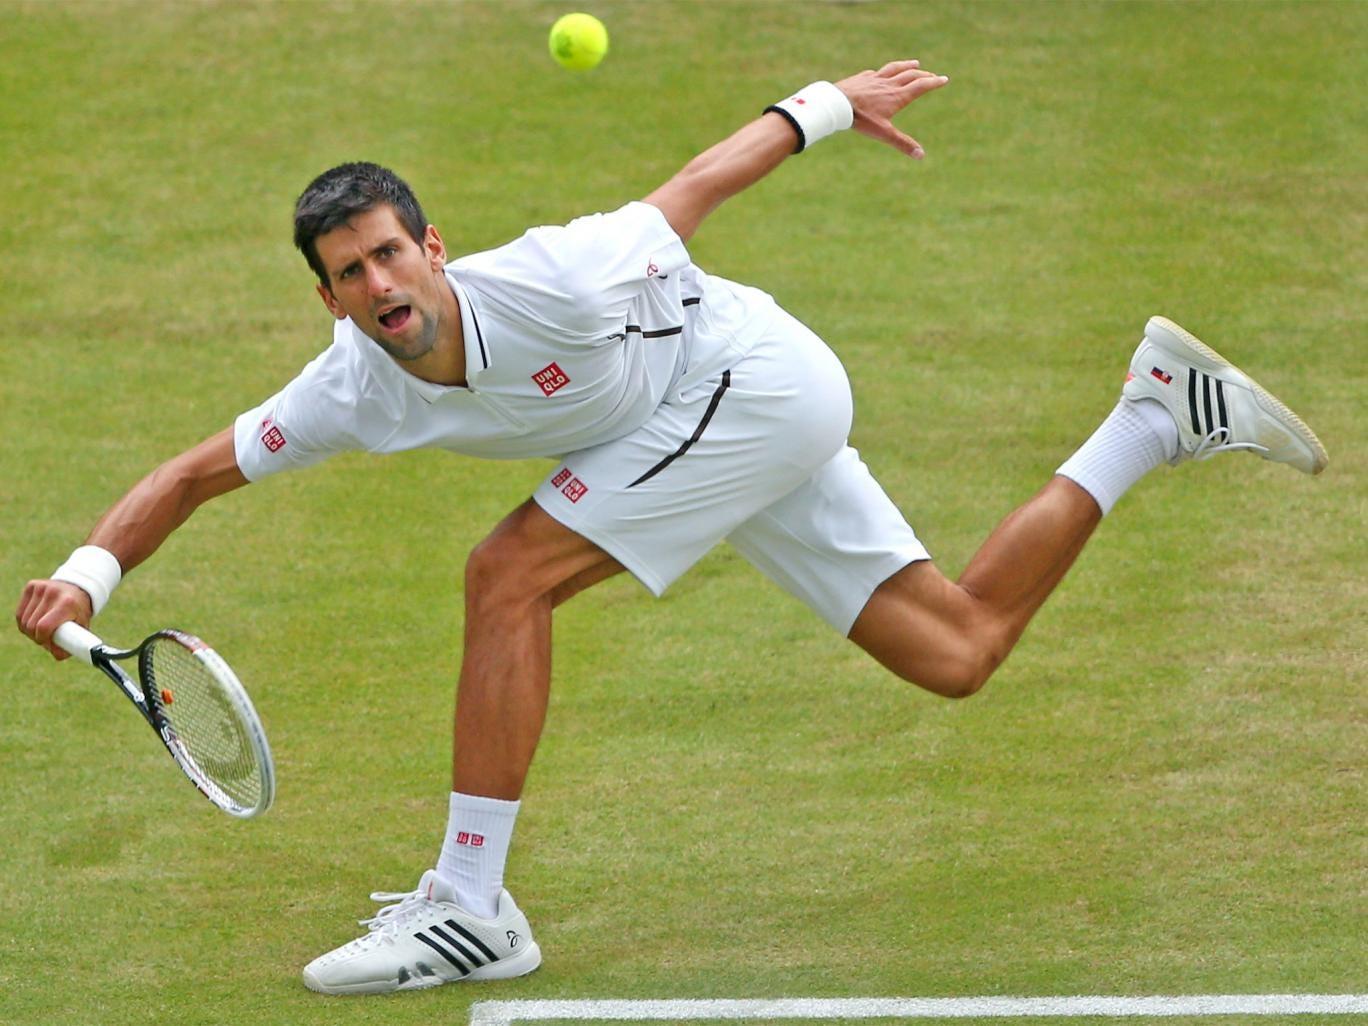 Novak Djokovic plays an awkward shot during his quarter-final victory over Tomas Berdych